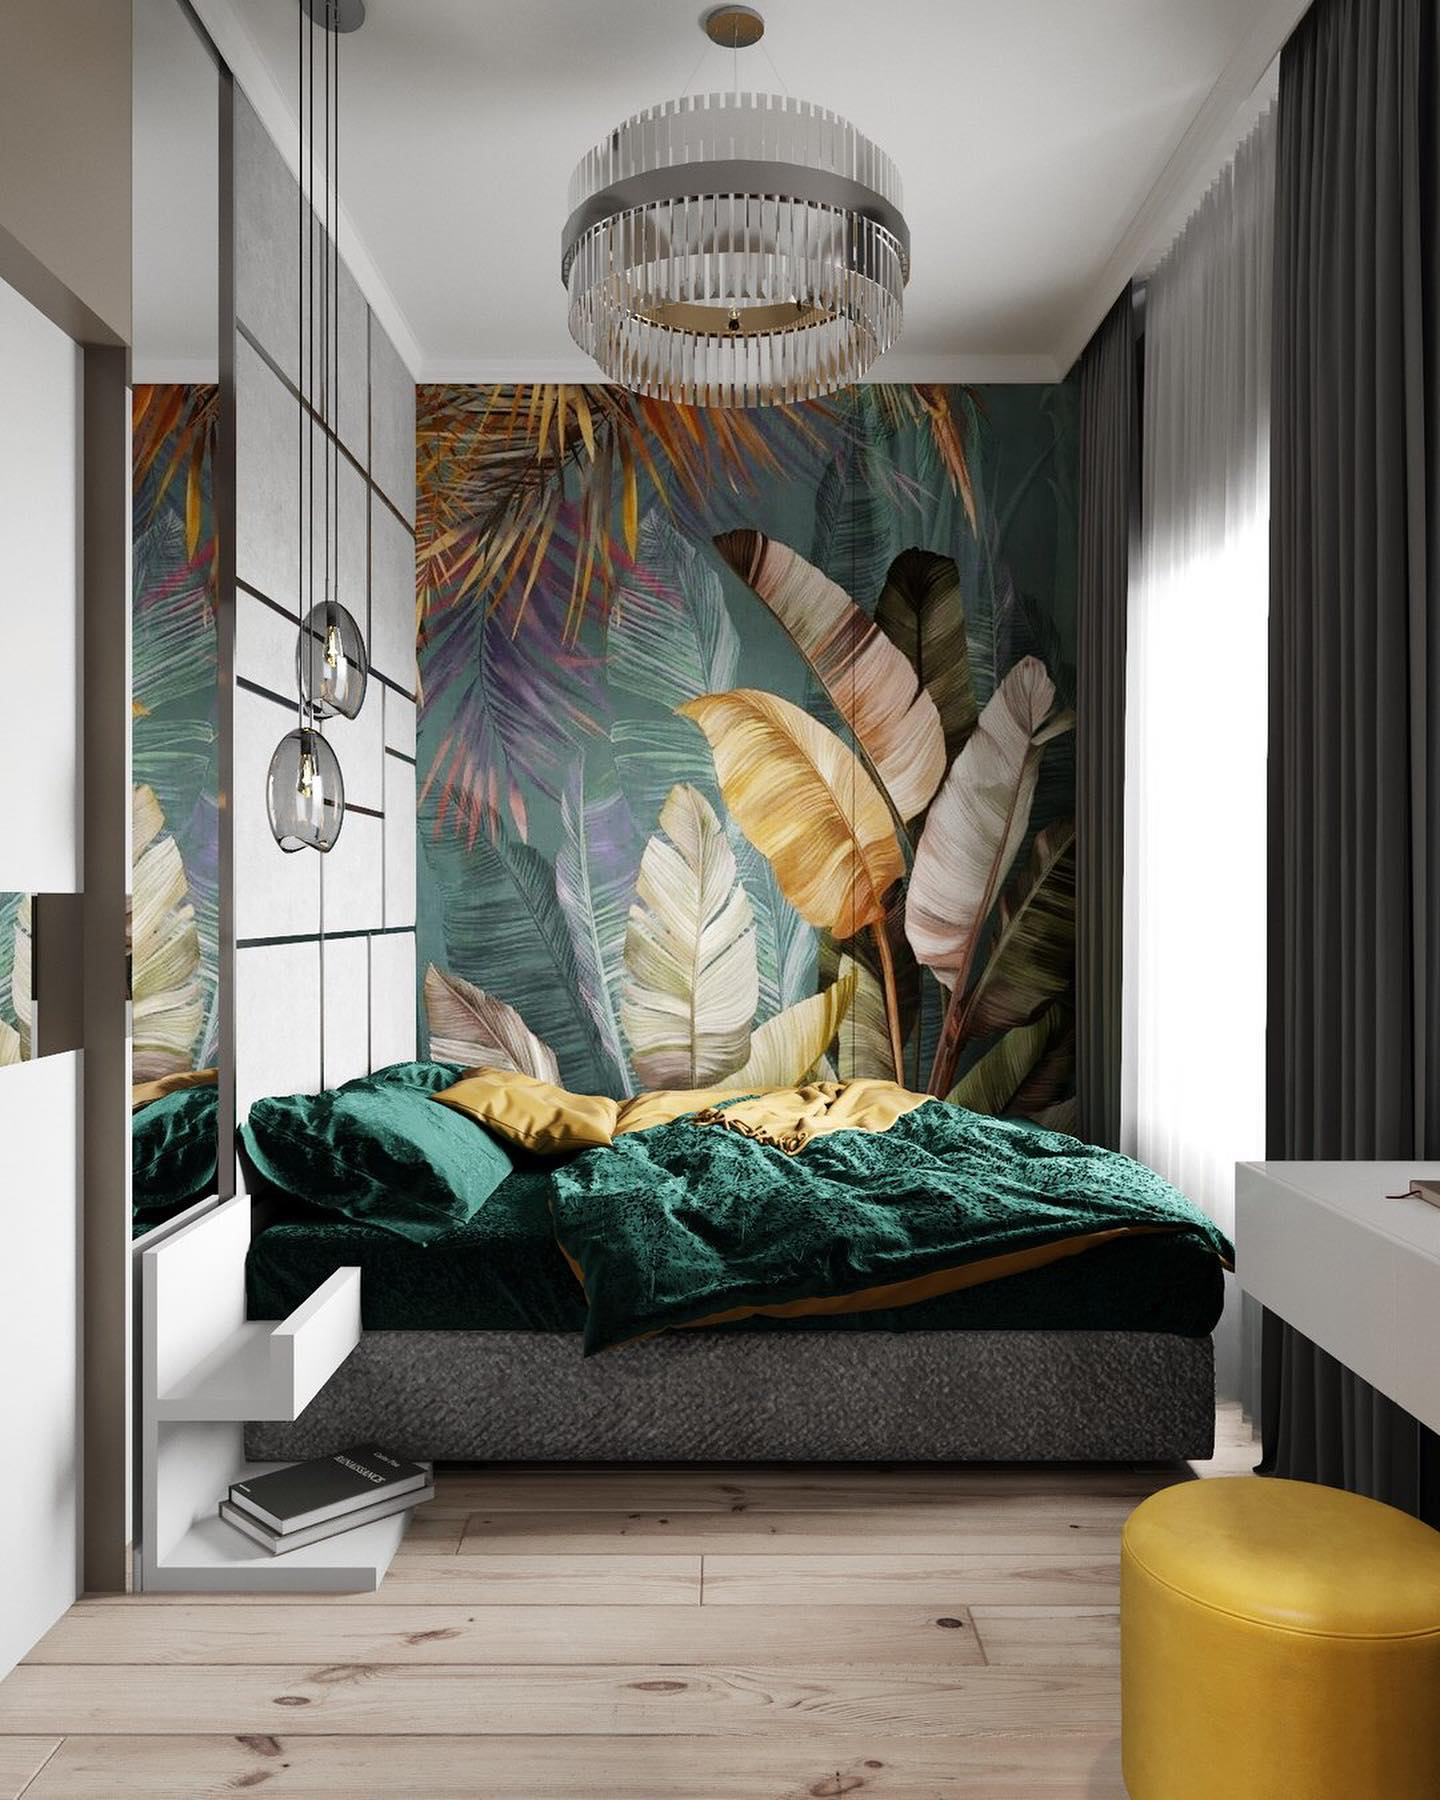 Interior design green bedroom interior design Interior Design Ideas with a Splash of Color 74304874 1245085662352537 6520598930512674816 o